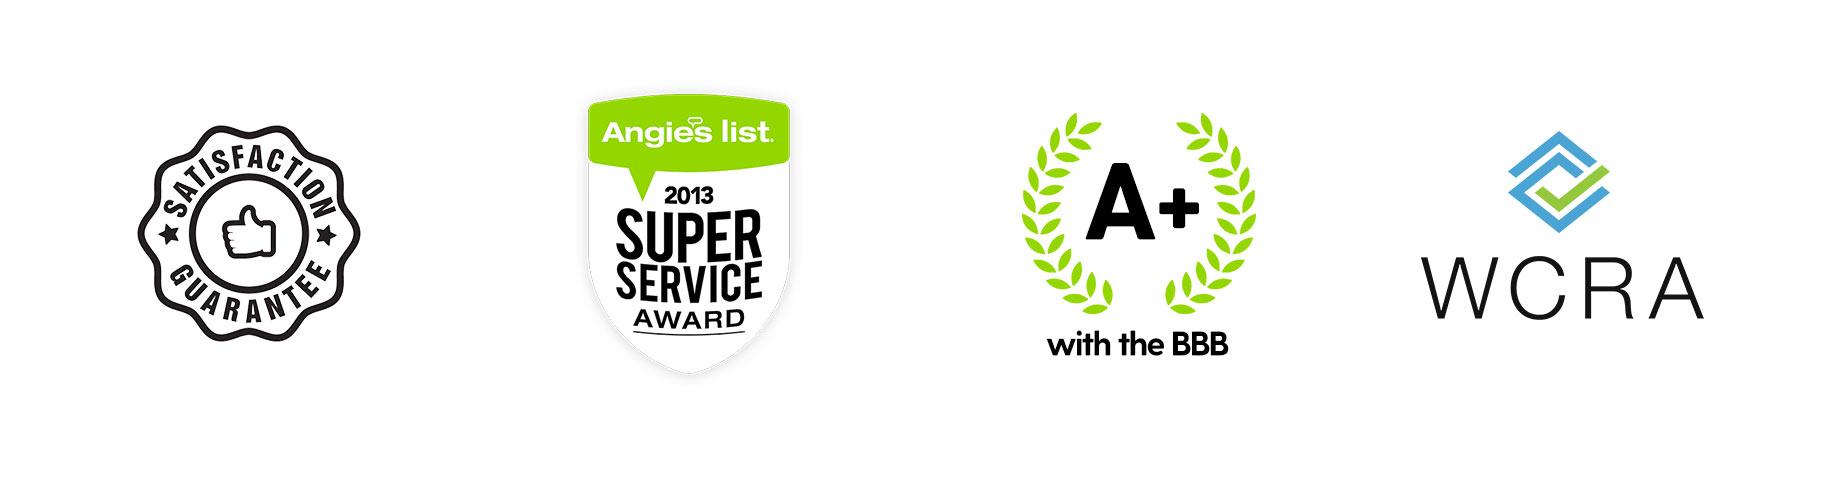 satisfaction-guarantee-angies-list-super-service-award-bbb